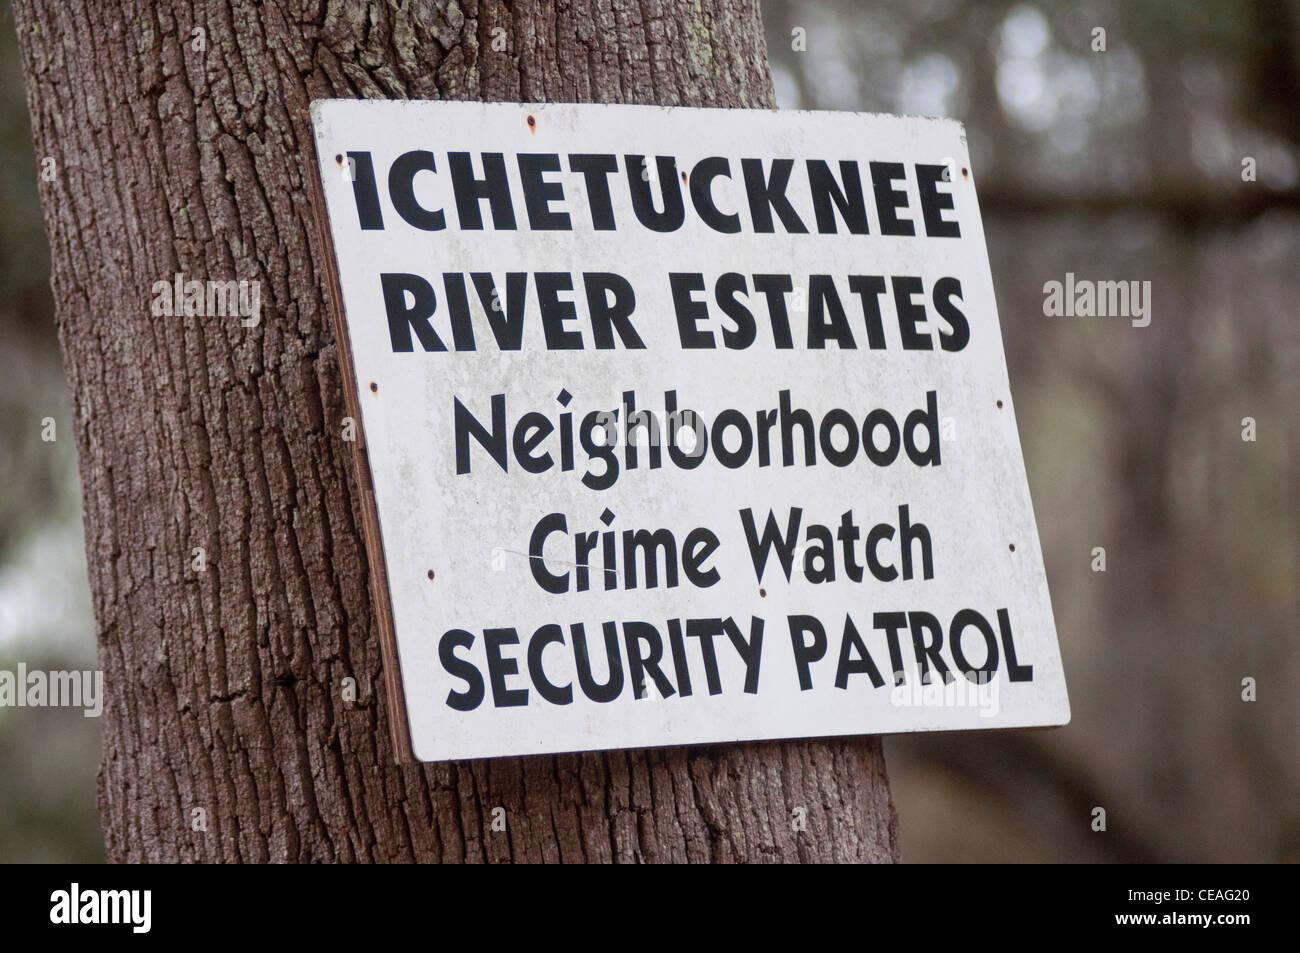 Ichetucknee river estates Neighborhood Crime Watch Security Patrol sign, Florida, United States, USA, tree - Stock Image